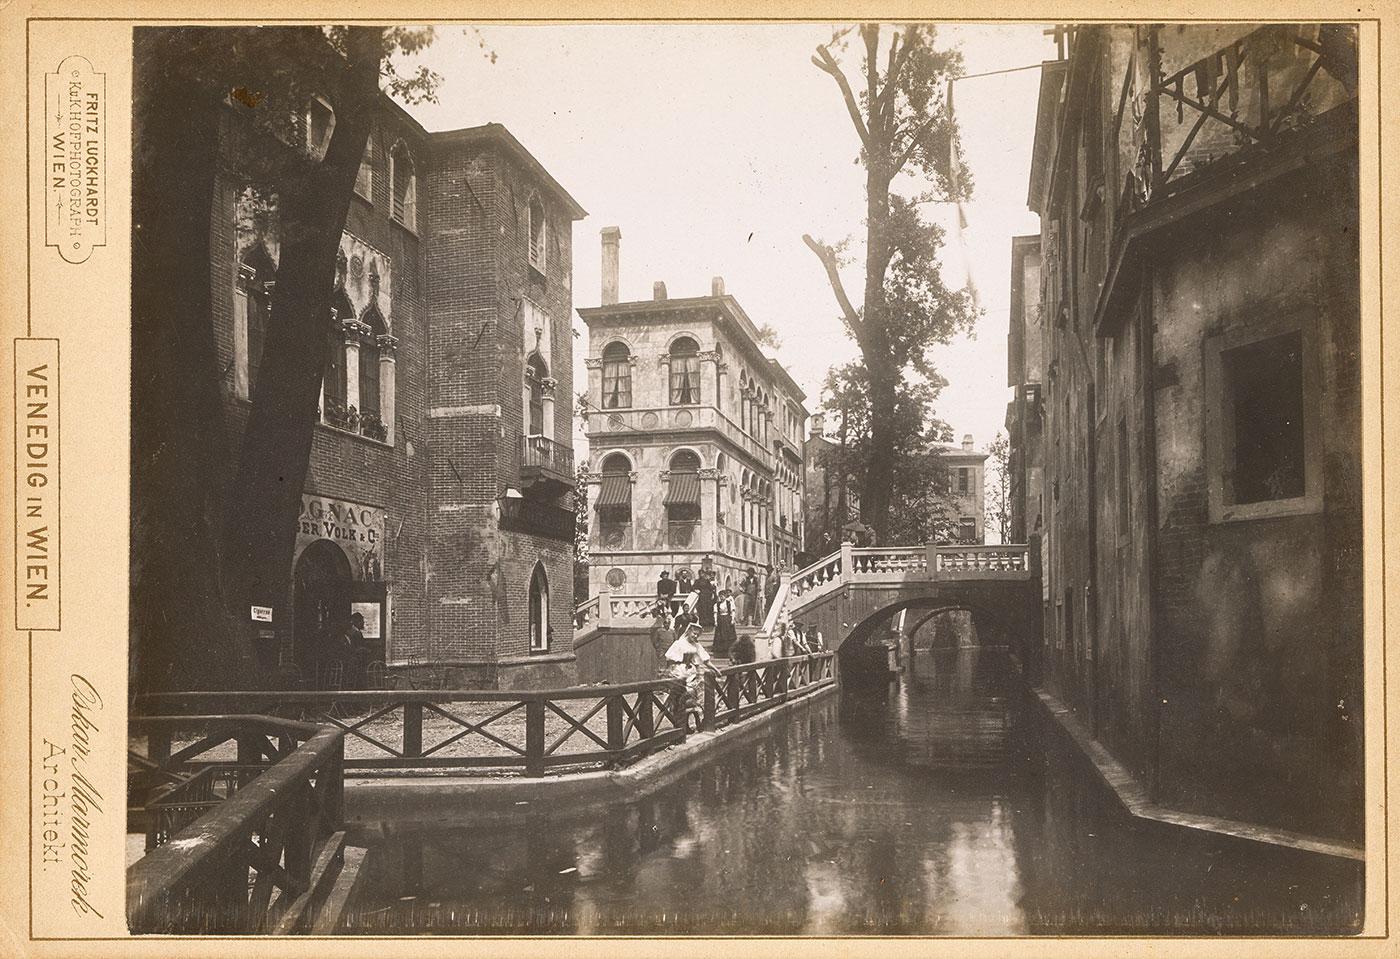 VenedigInWien